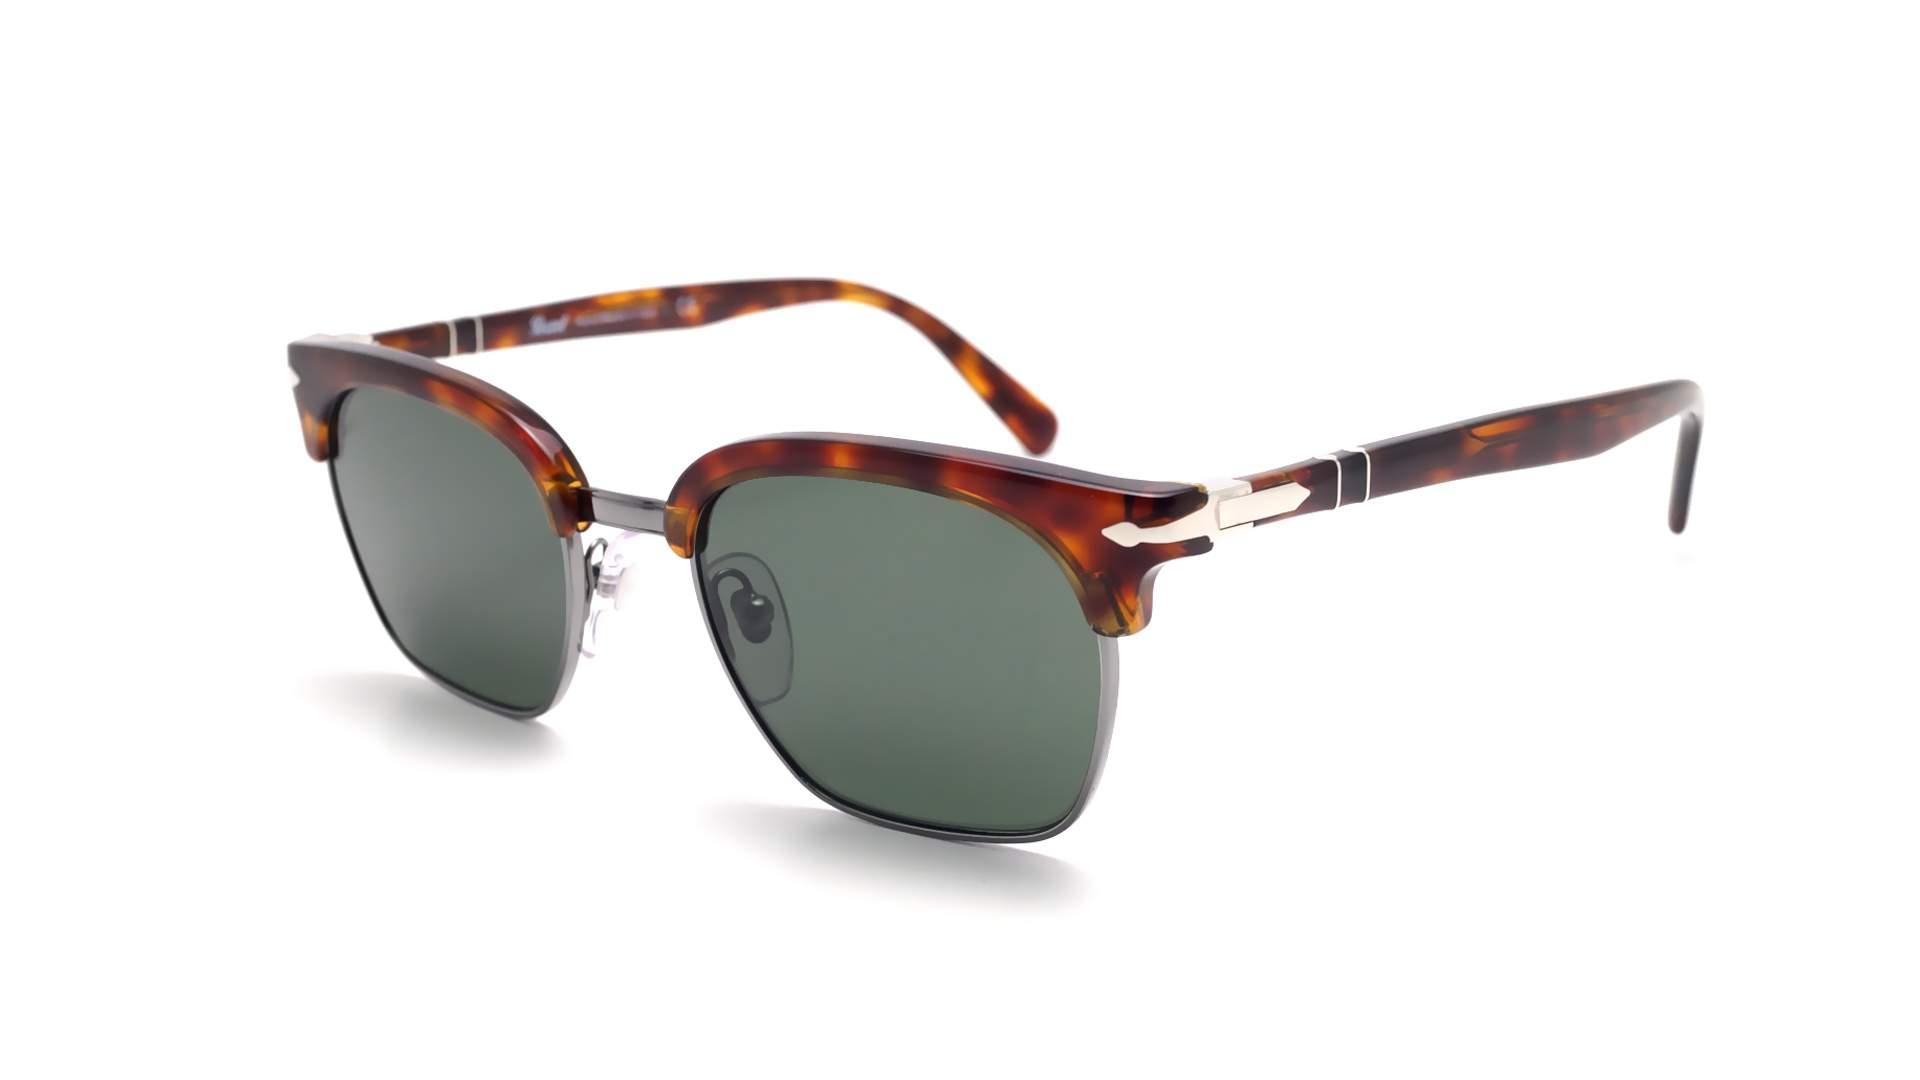 c269a32d58 Sunglasses Persol Tailoring edition Havana Tortoise PO3199S 24 31 50-20  Medium